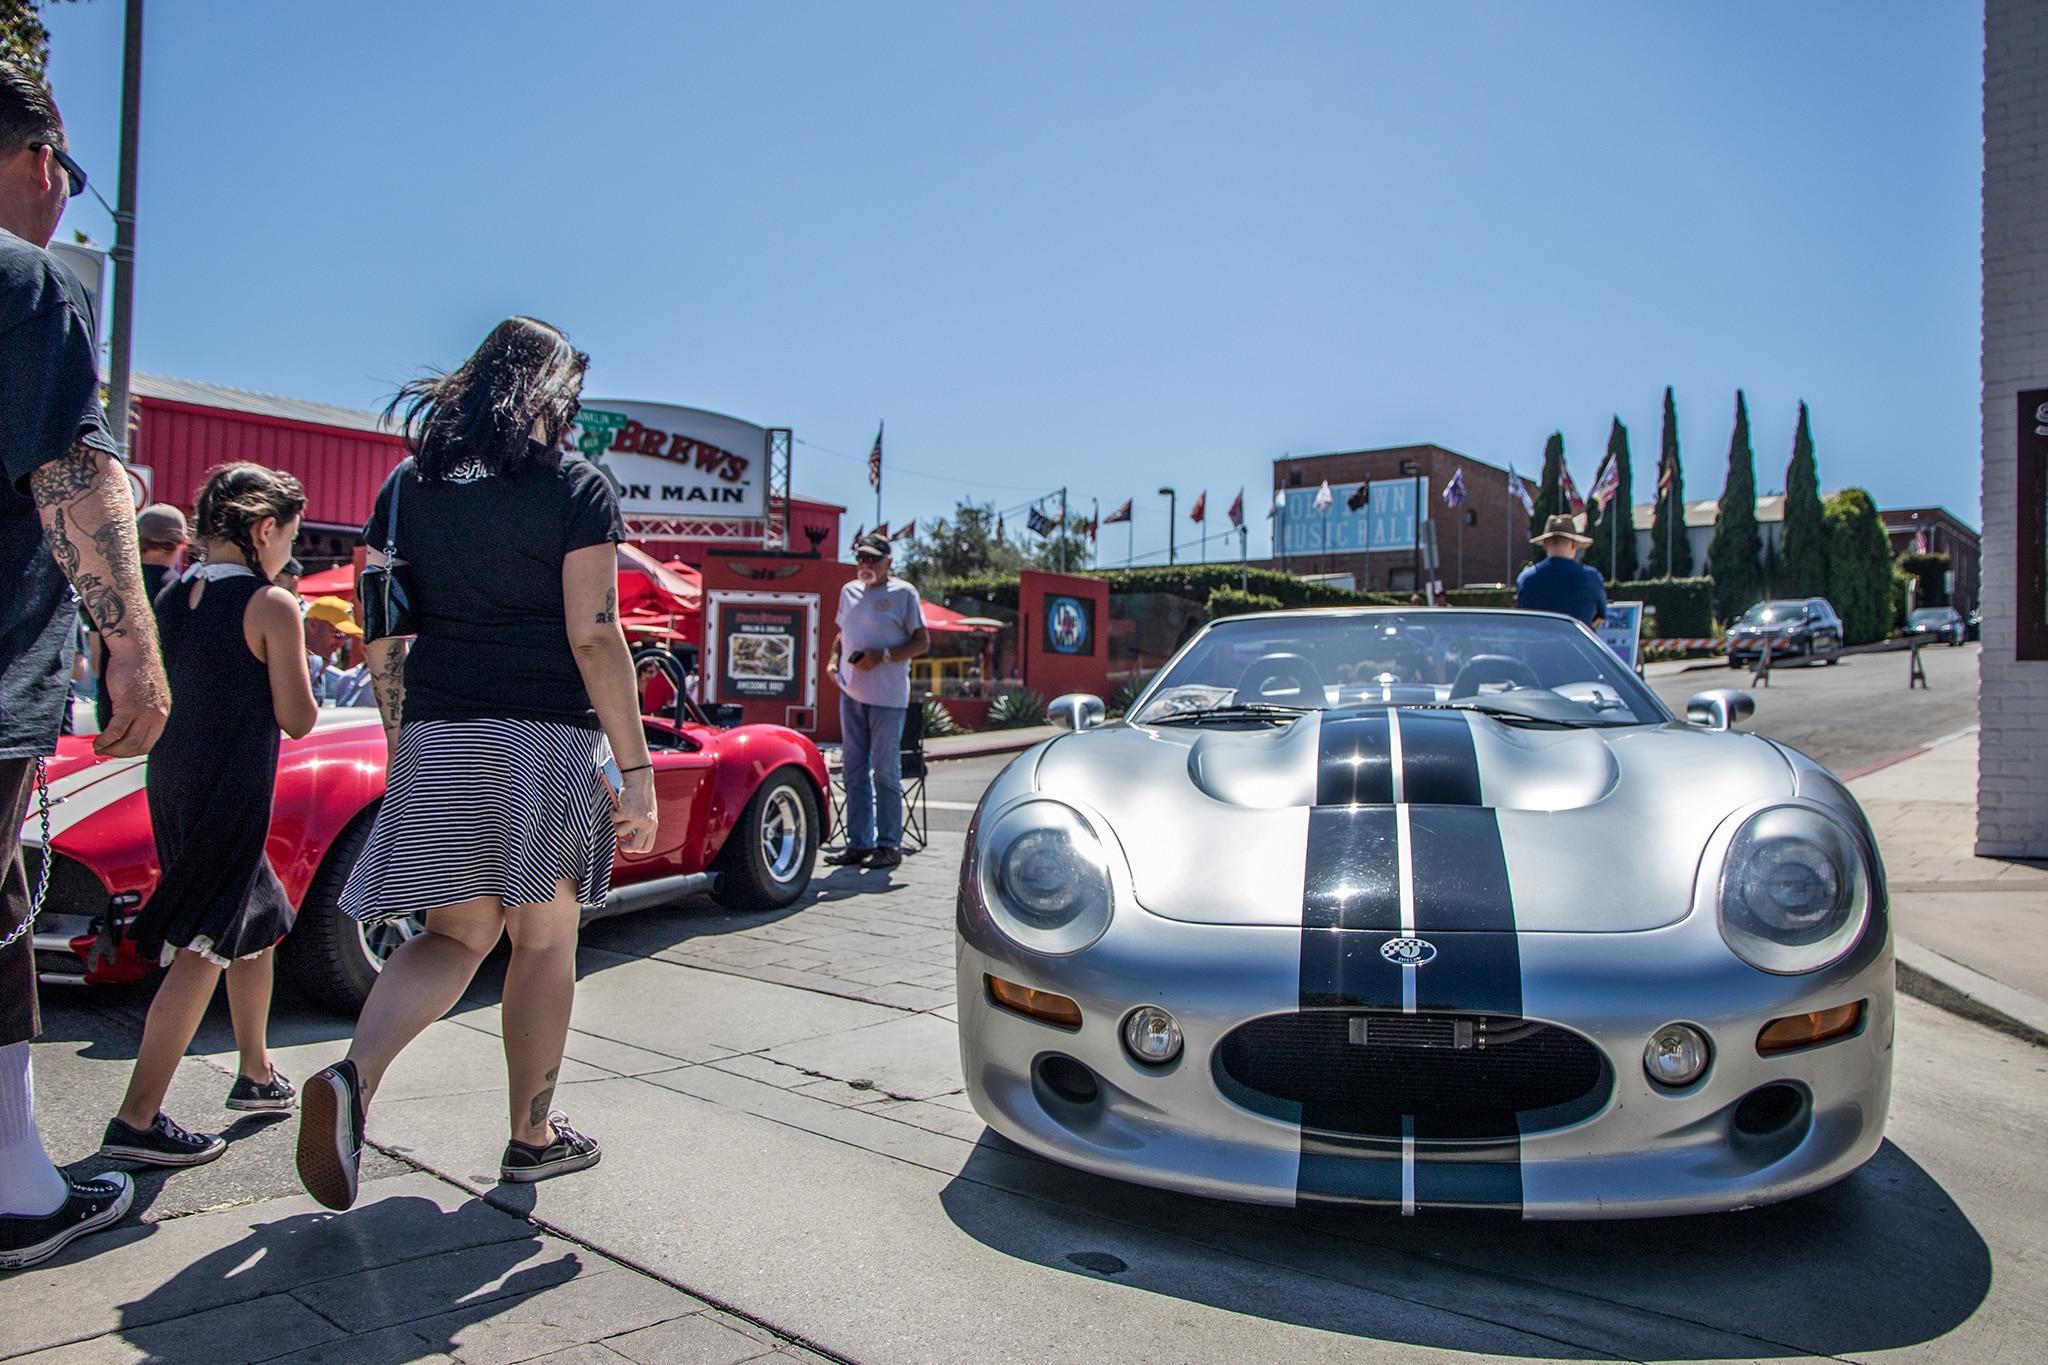 20th Annual El Segundo Main Street Car Show is Alive and Kicking